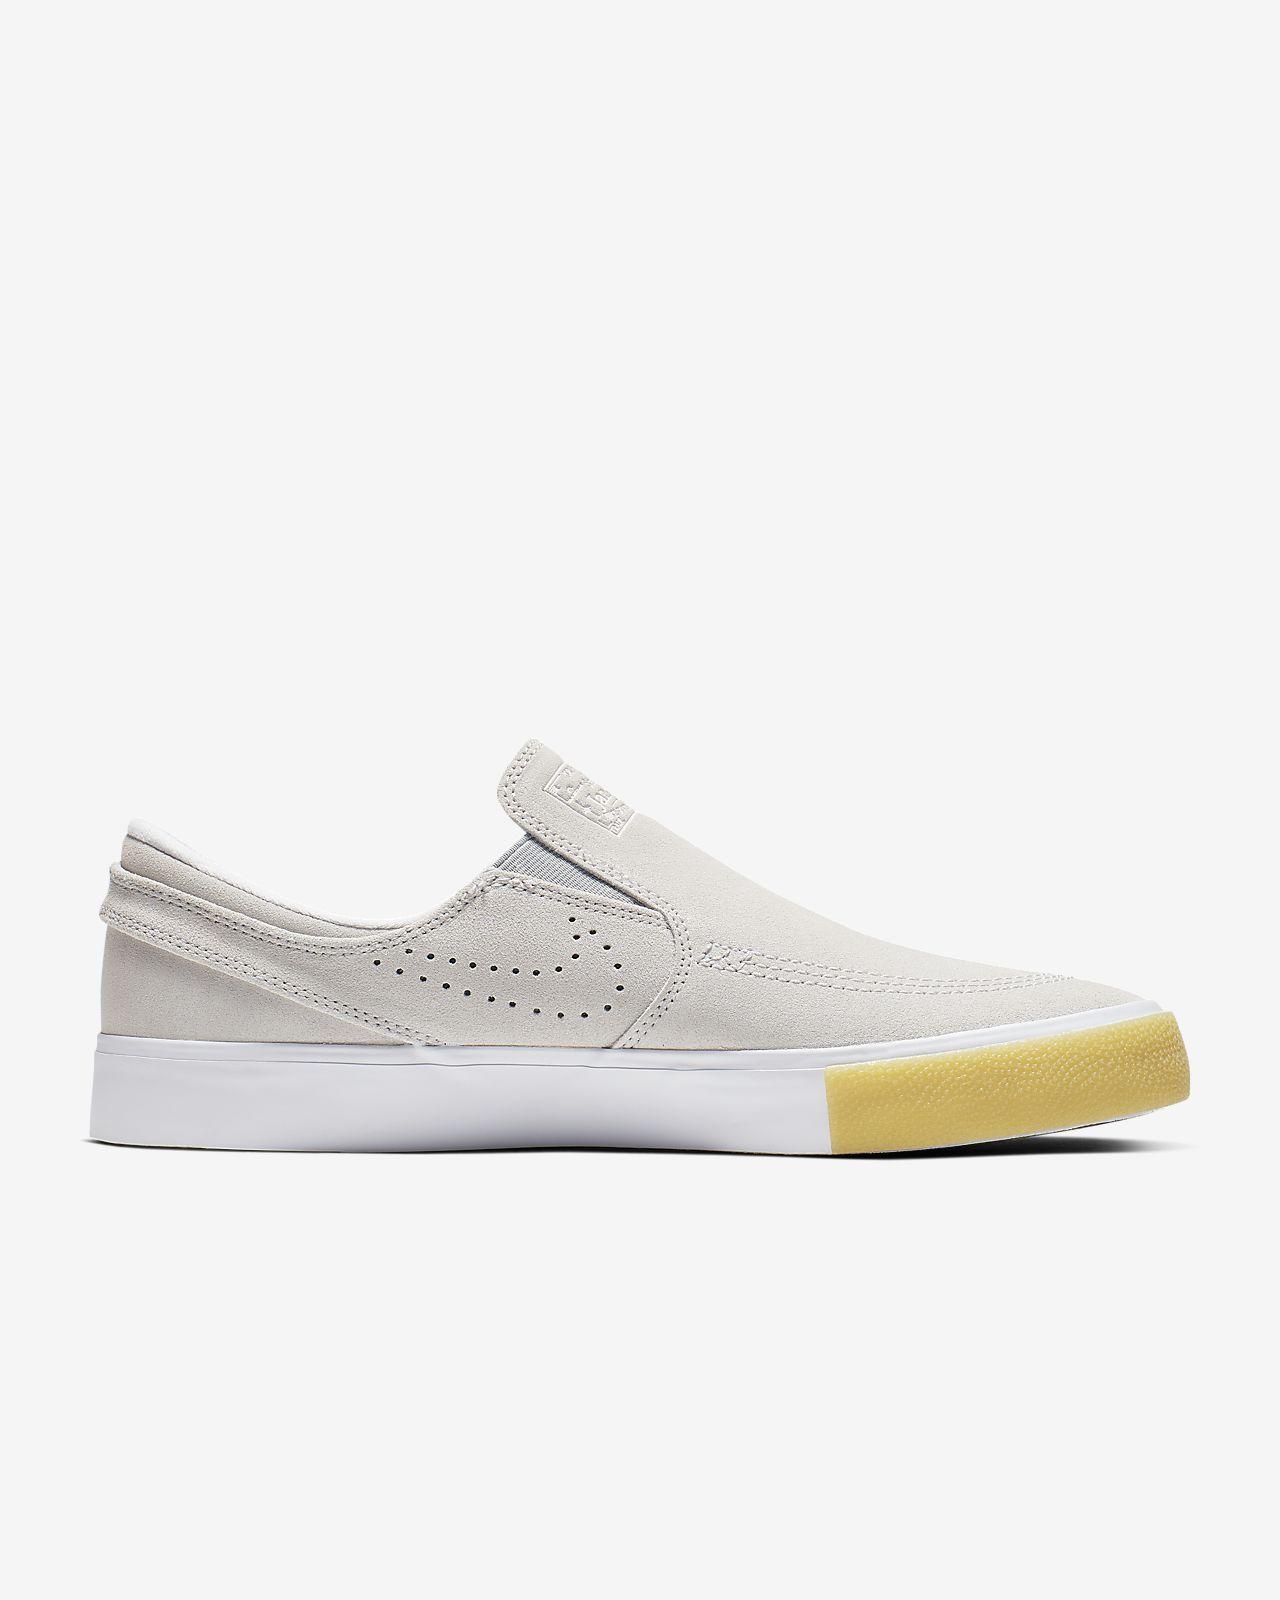 new style 9a2c5 0bef4 ... Nike SB Zoom Stefan Janoski Slip RM SE Skate Shoe